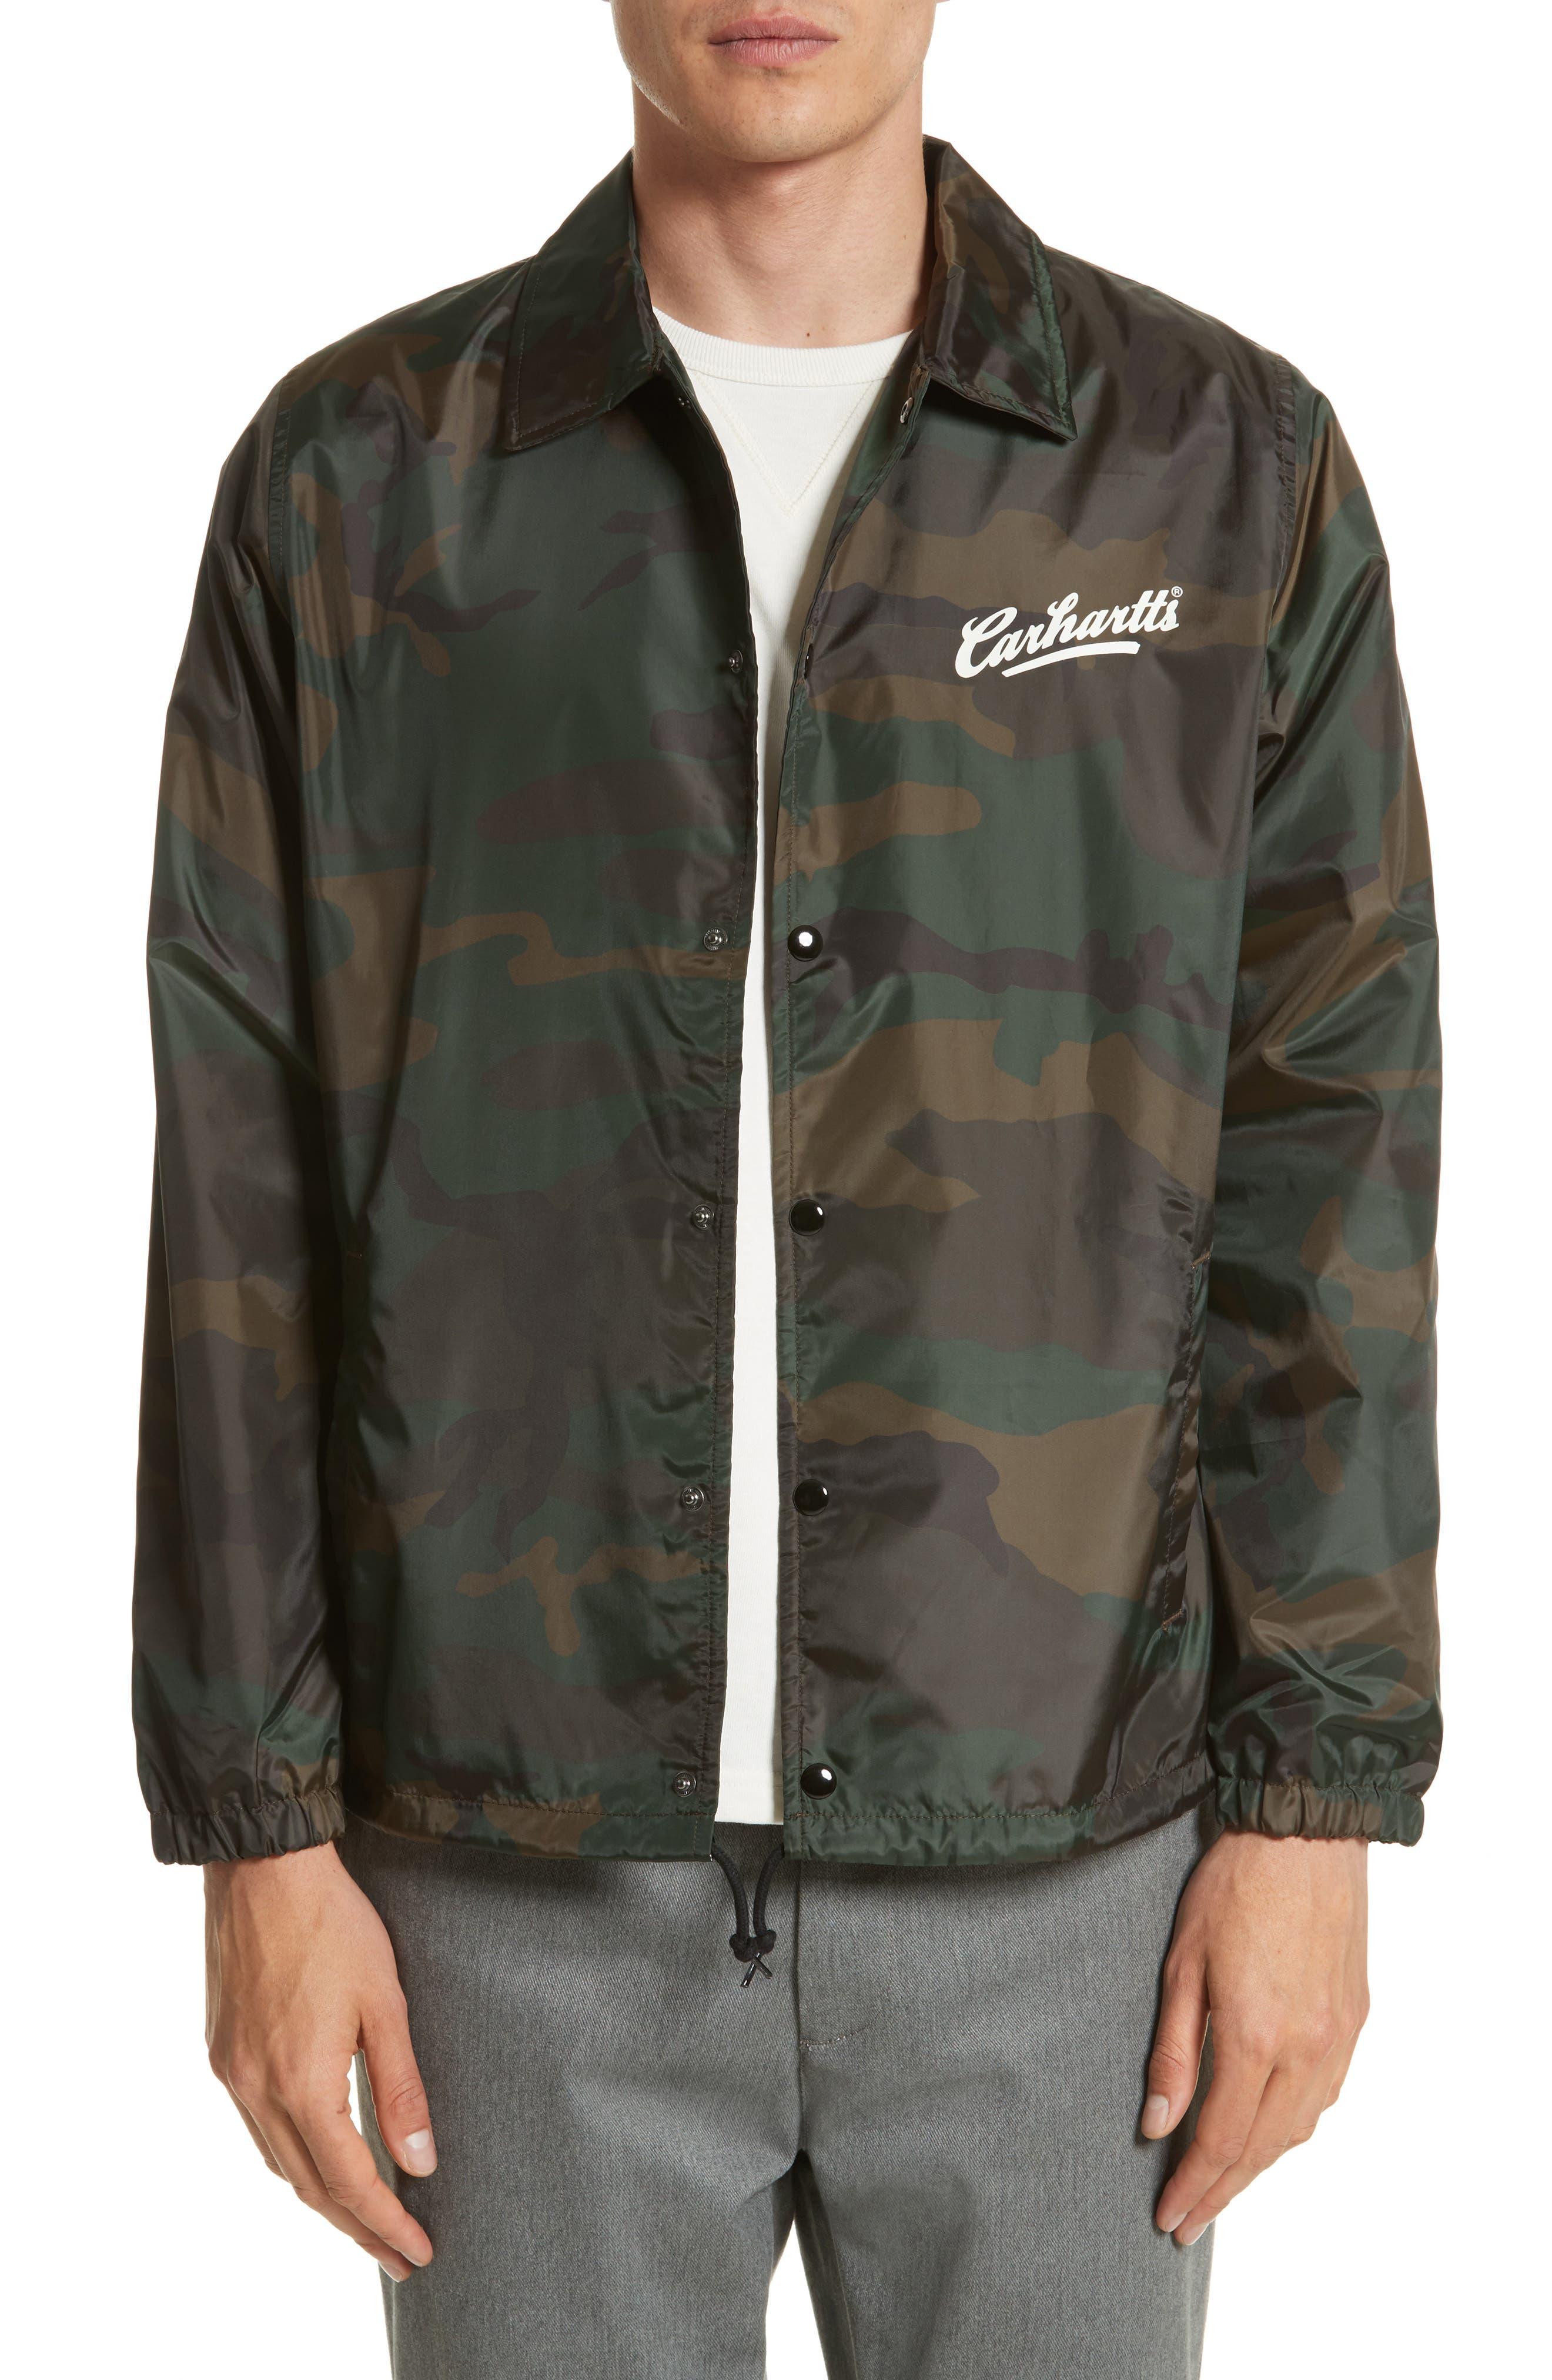 Camo Print Coach Jacket,                         Main,                         color, Camo Combat Green/White